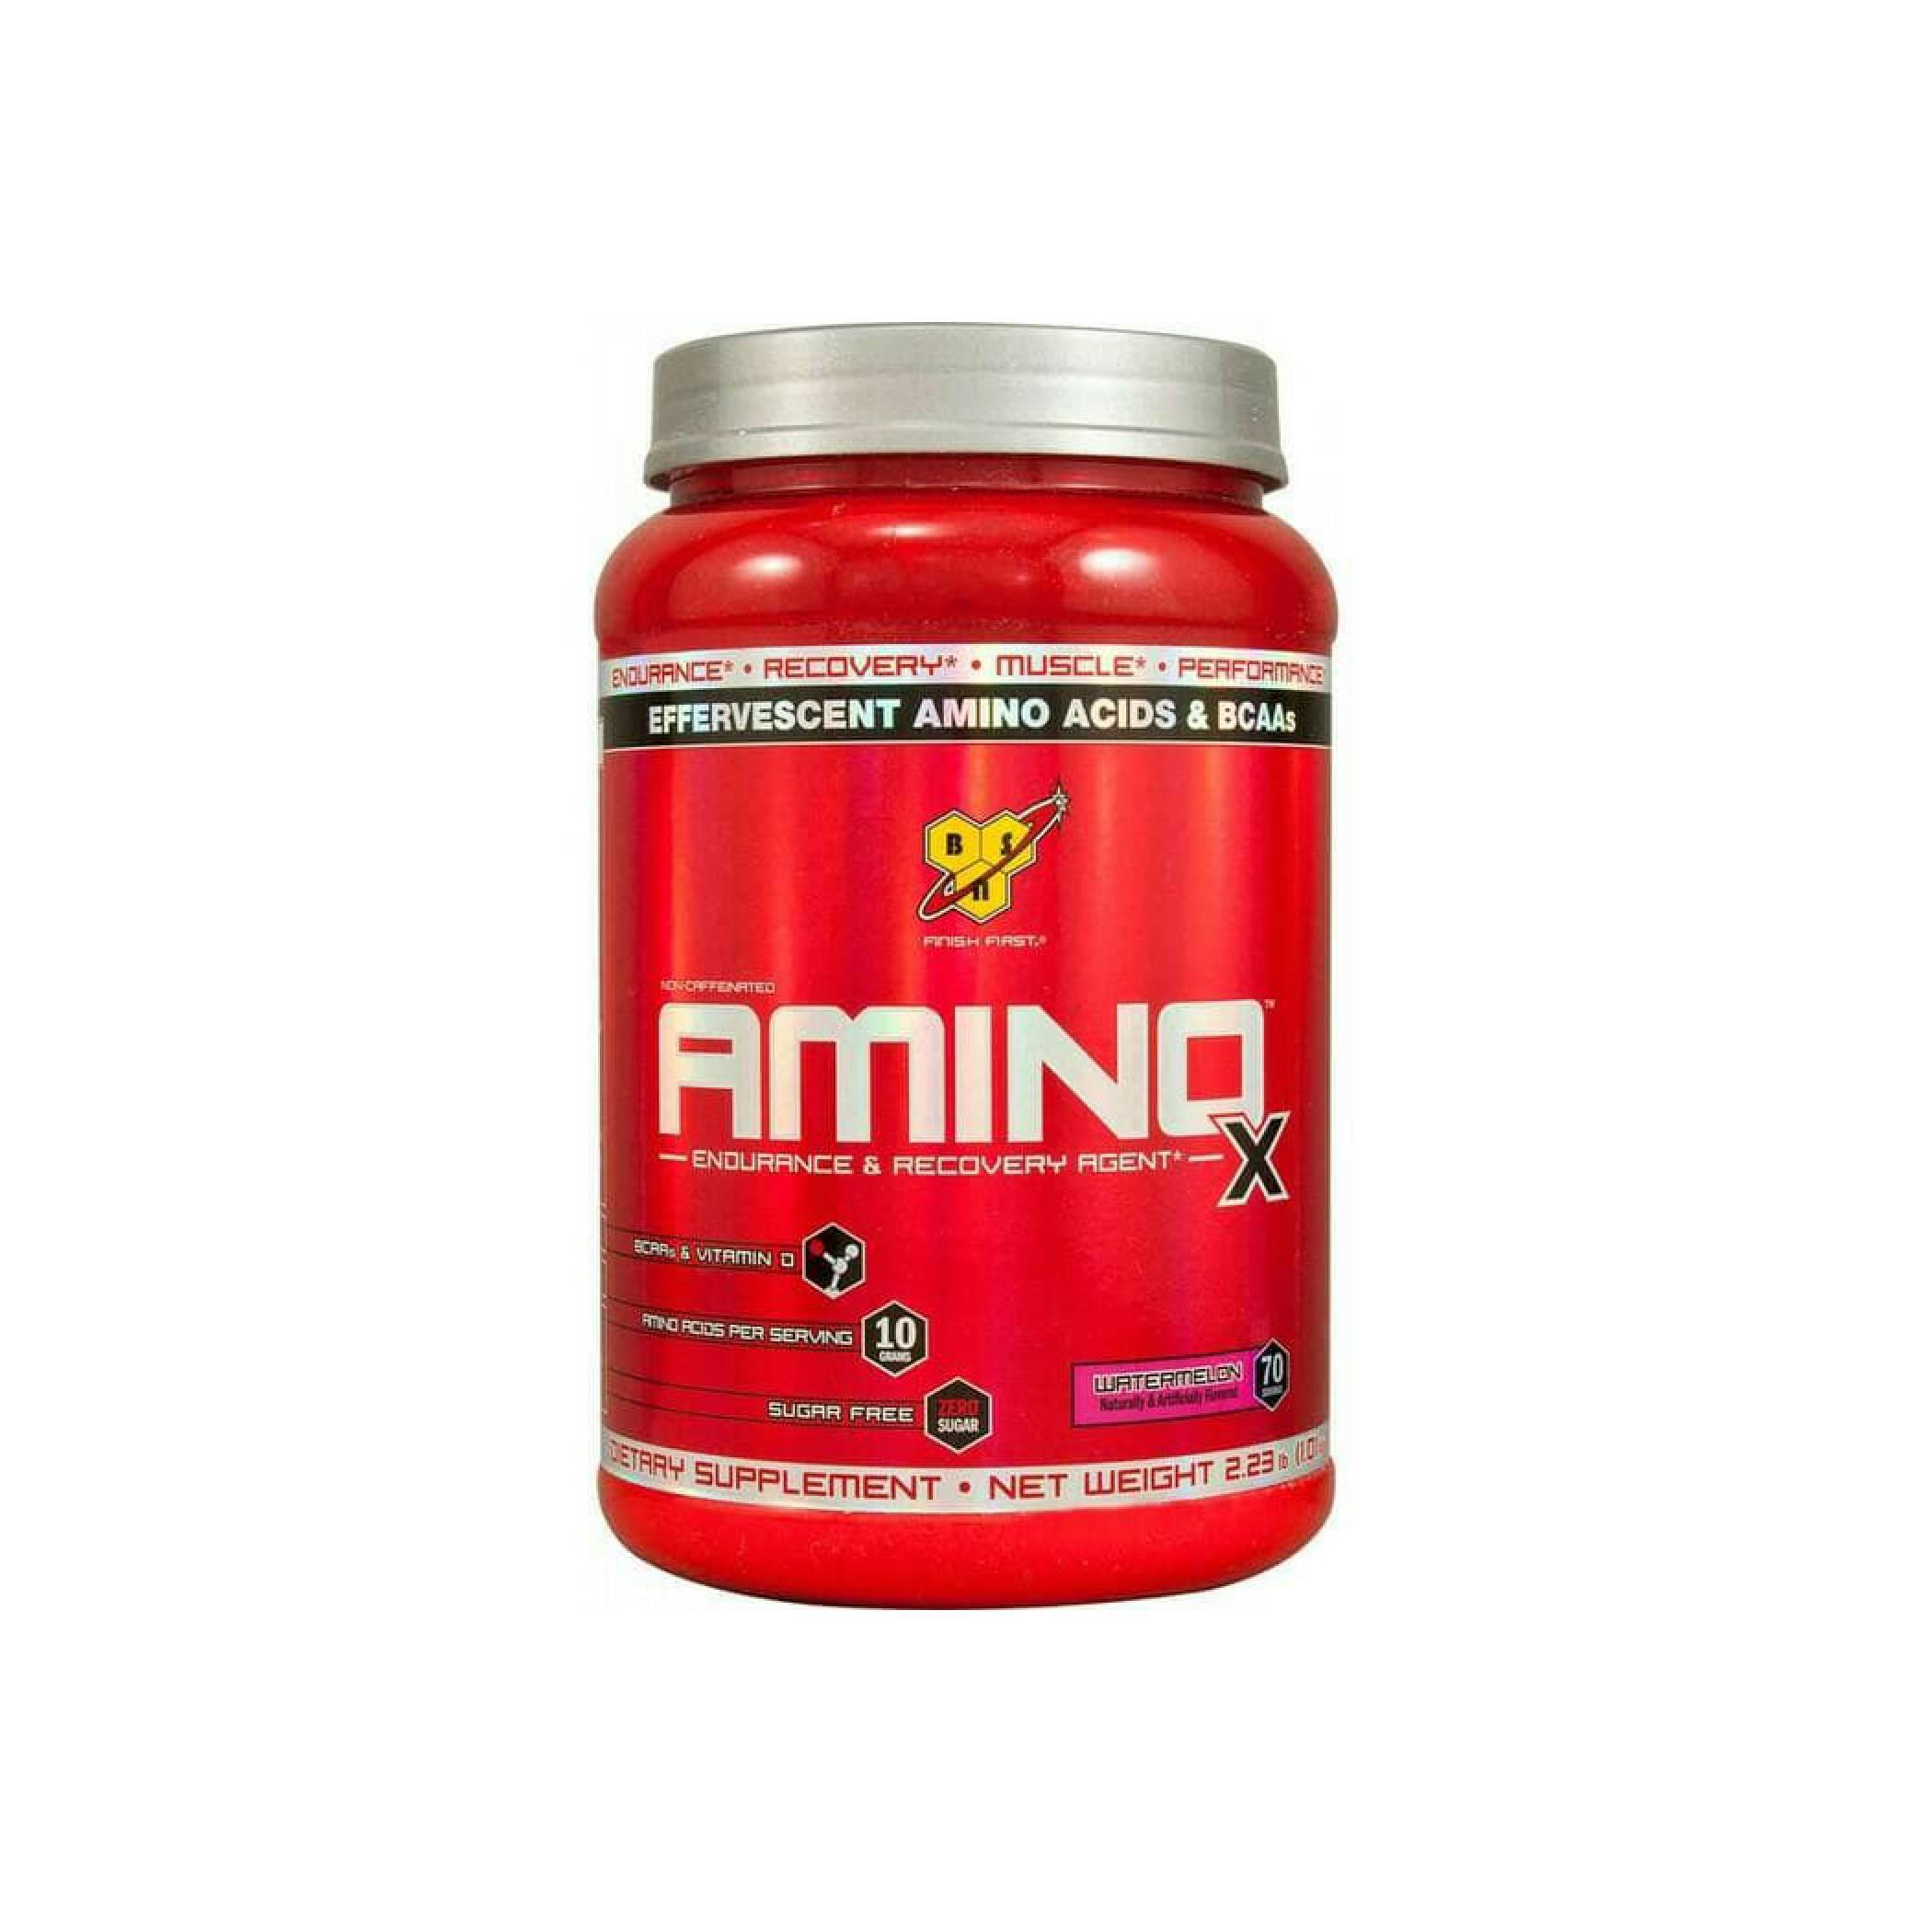 BSN Aminox Amino X Amino-X 70 70x 70serv 70serving serv servings mura